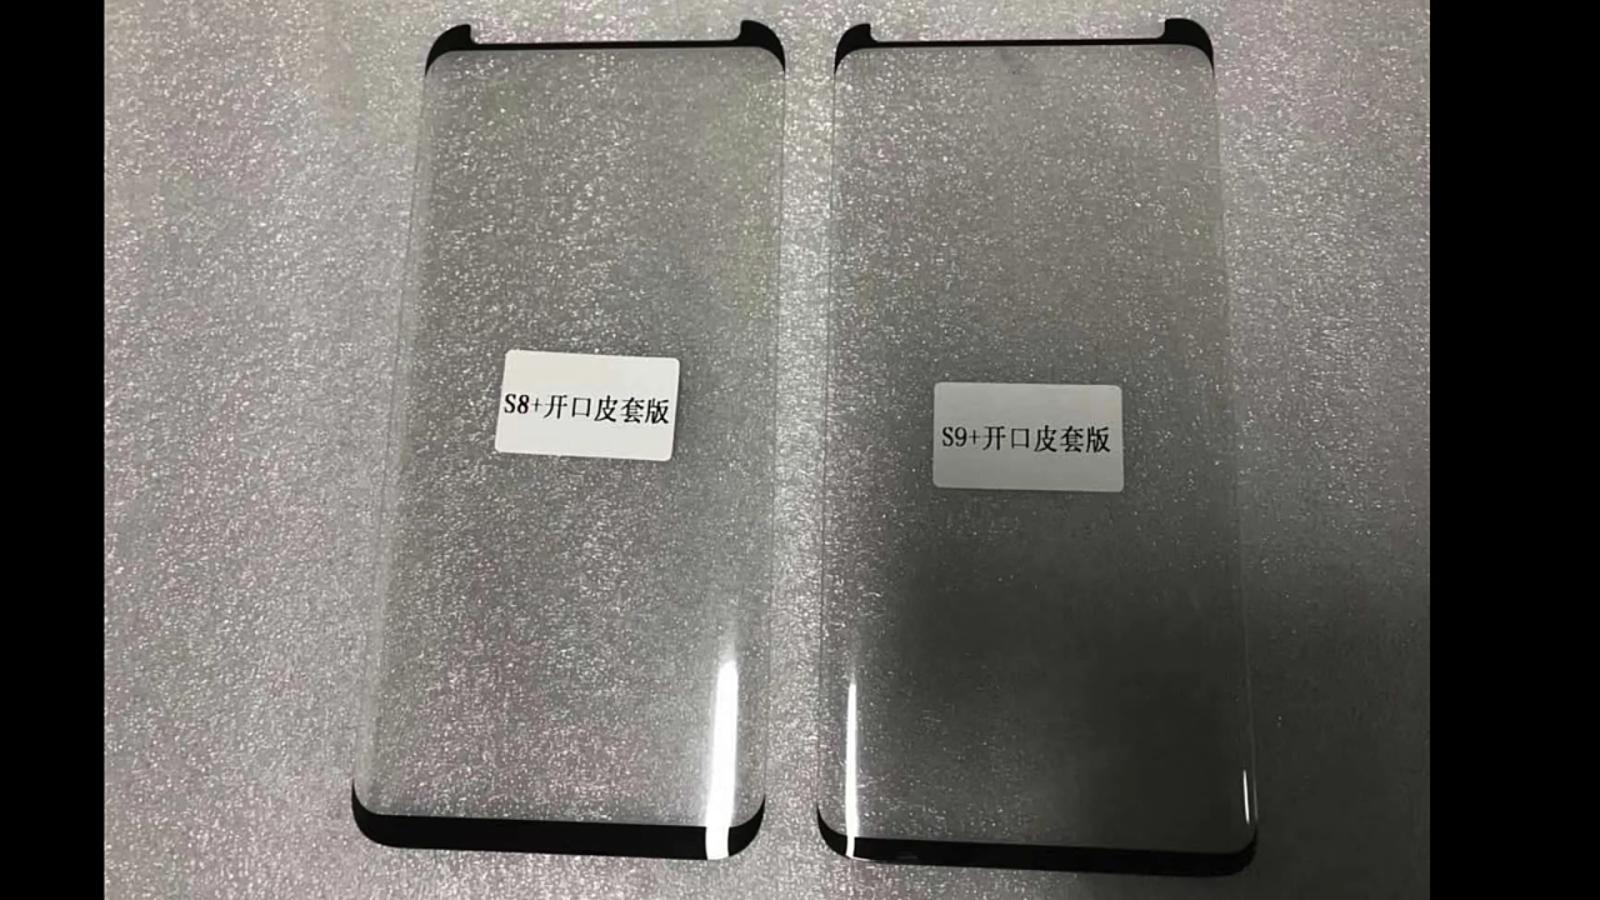 Samsung galaxy s8 and s9 screen protectors